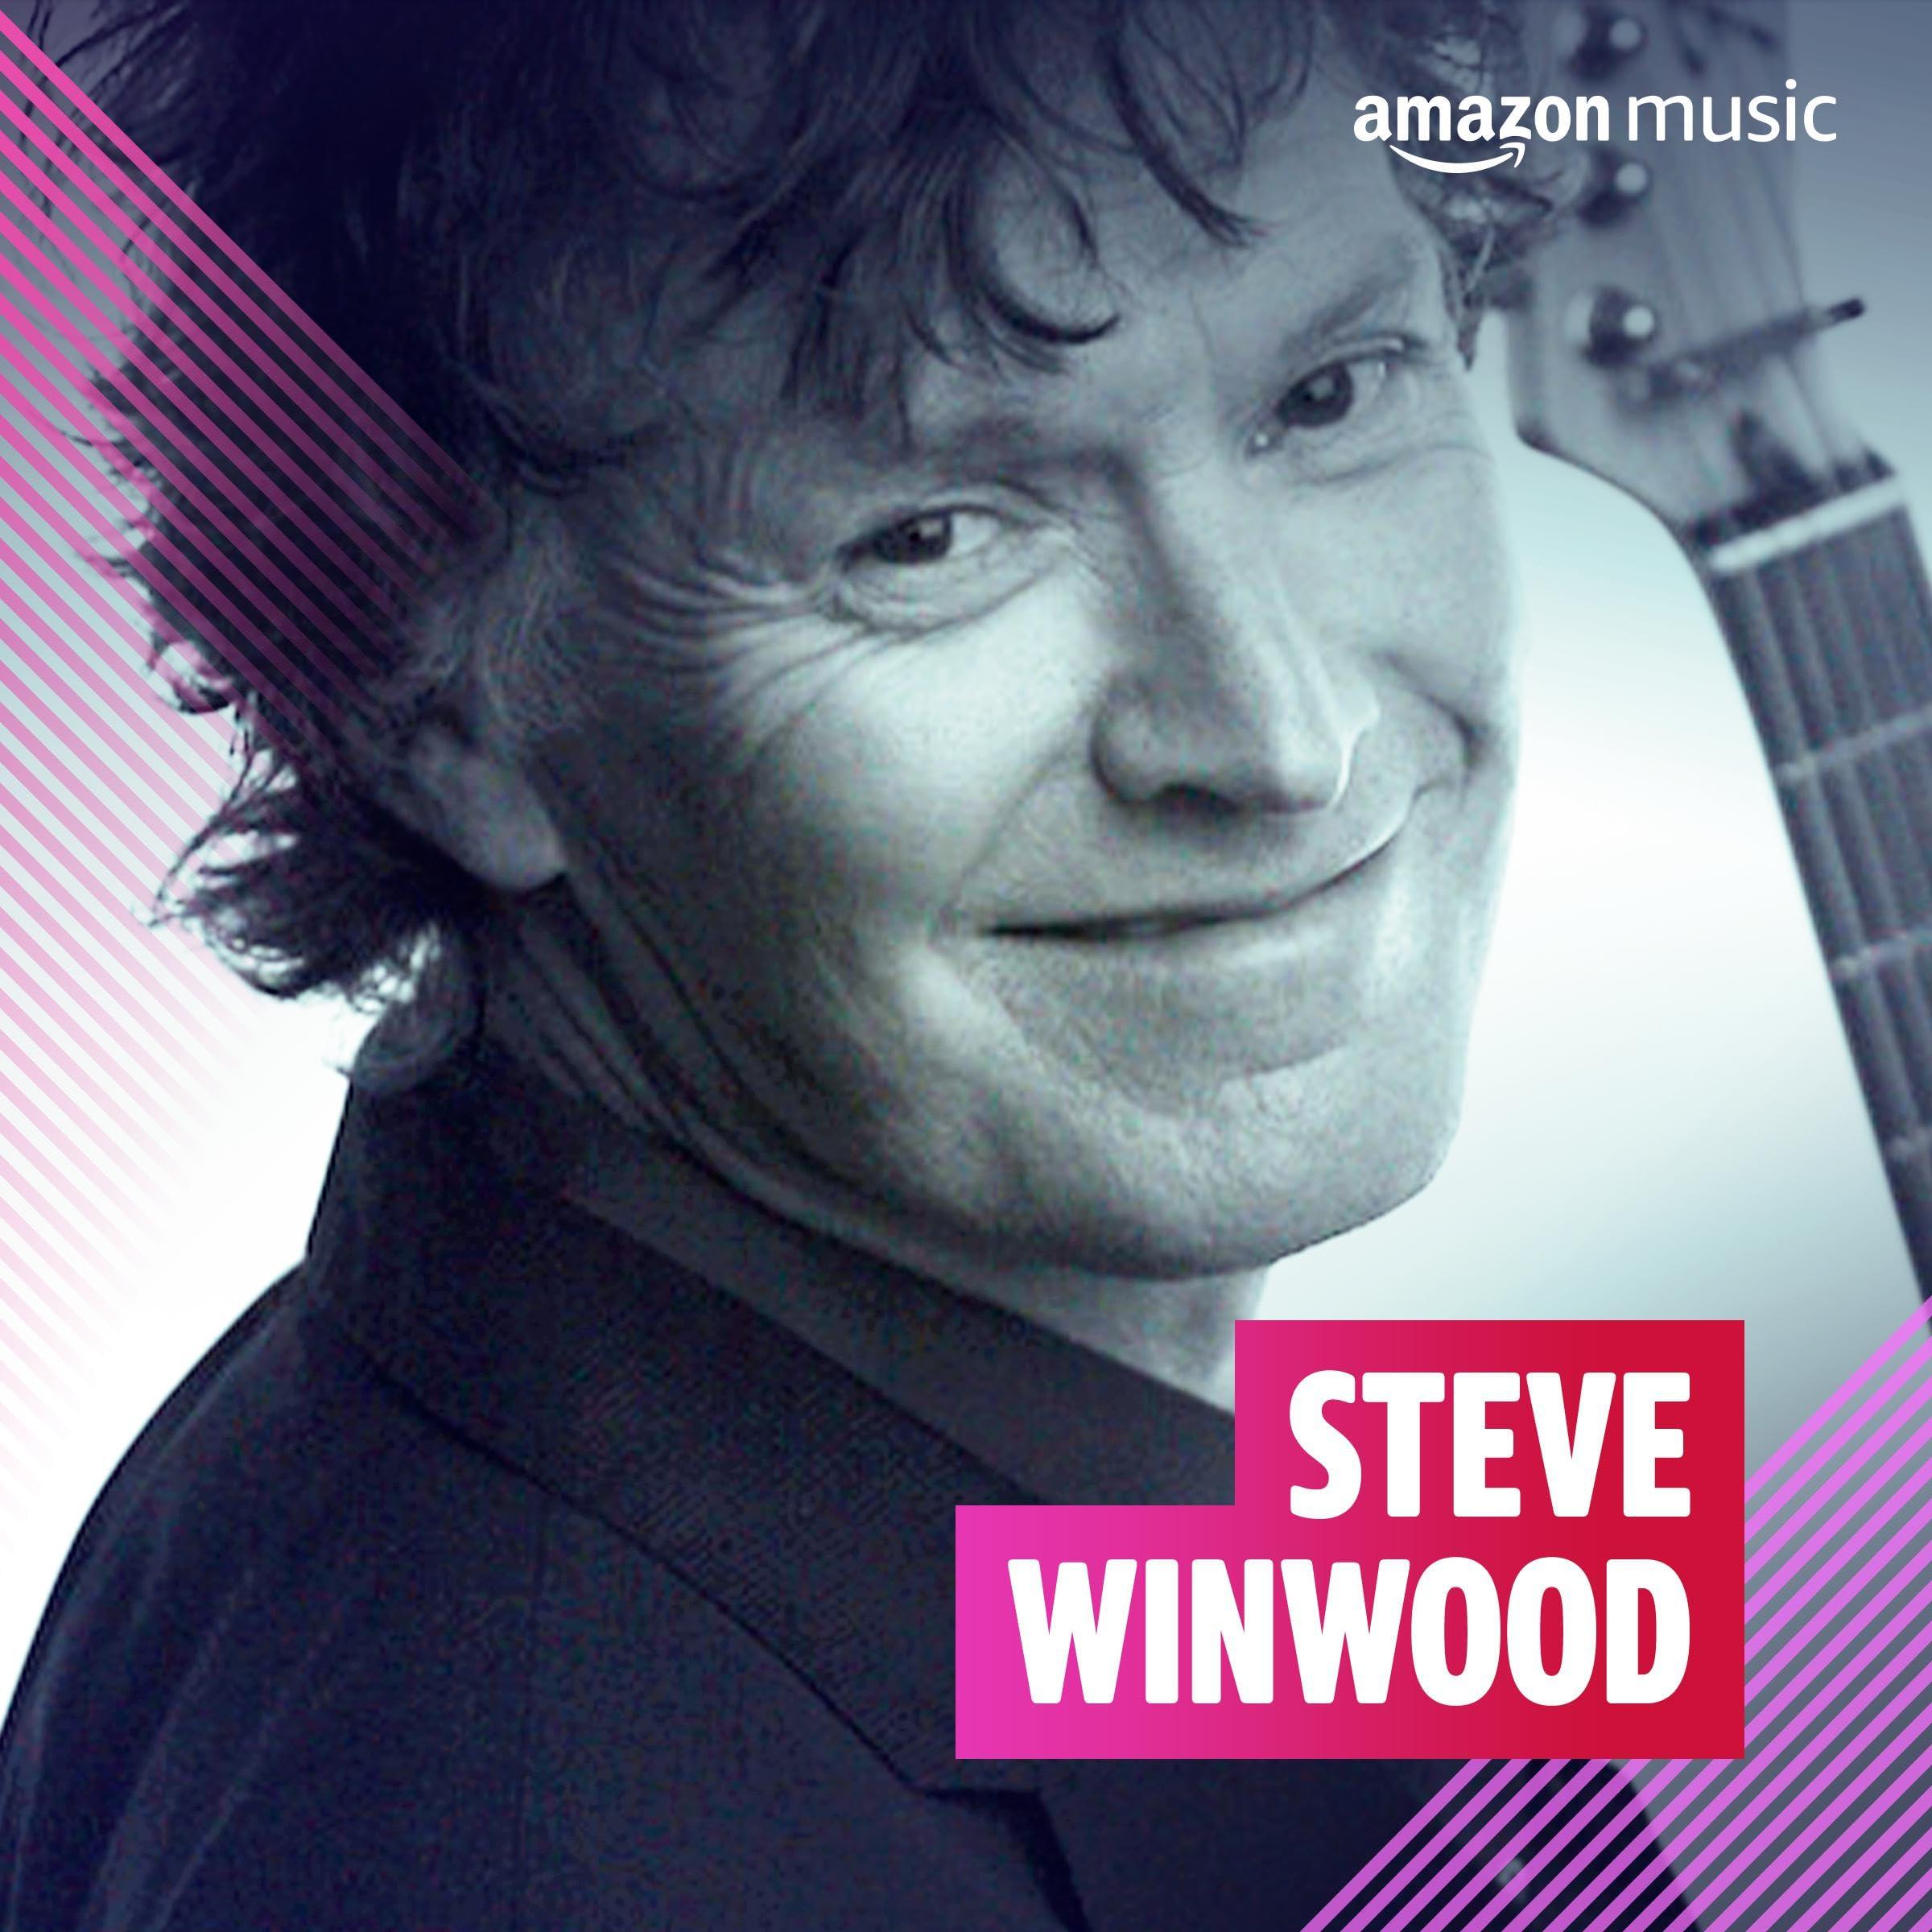 Steve Winwood